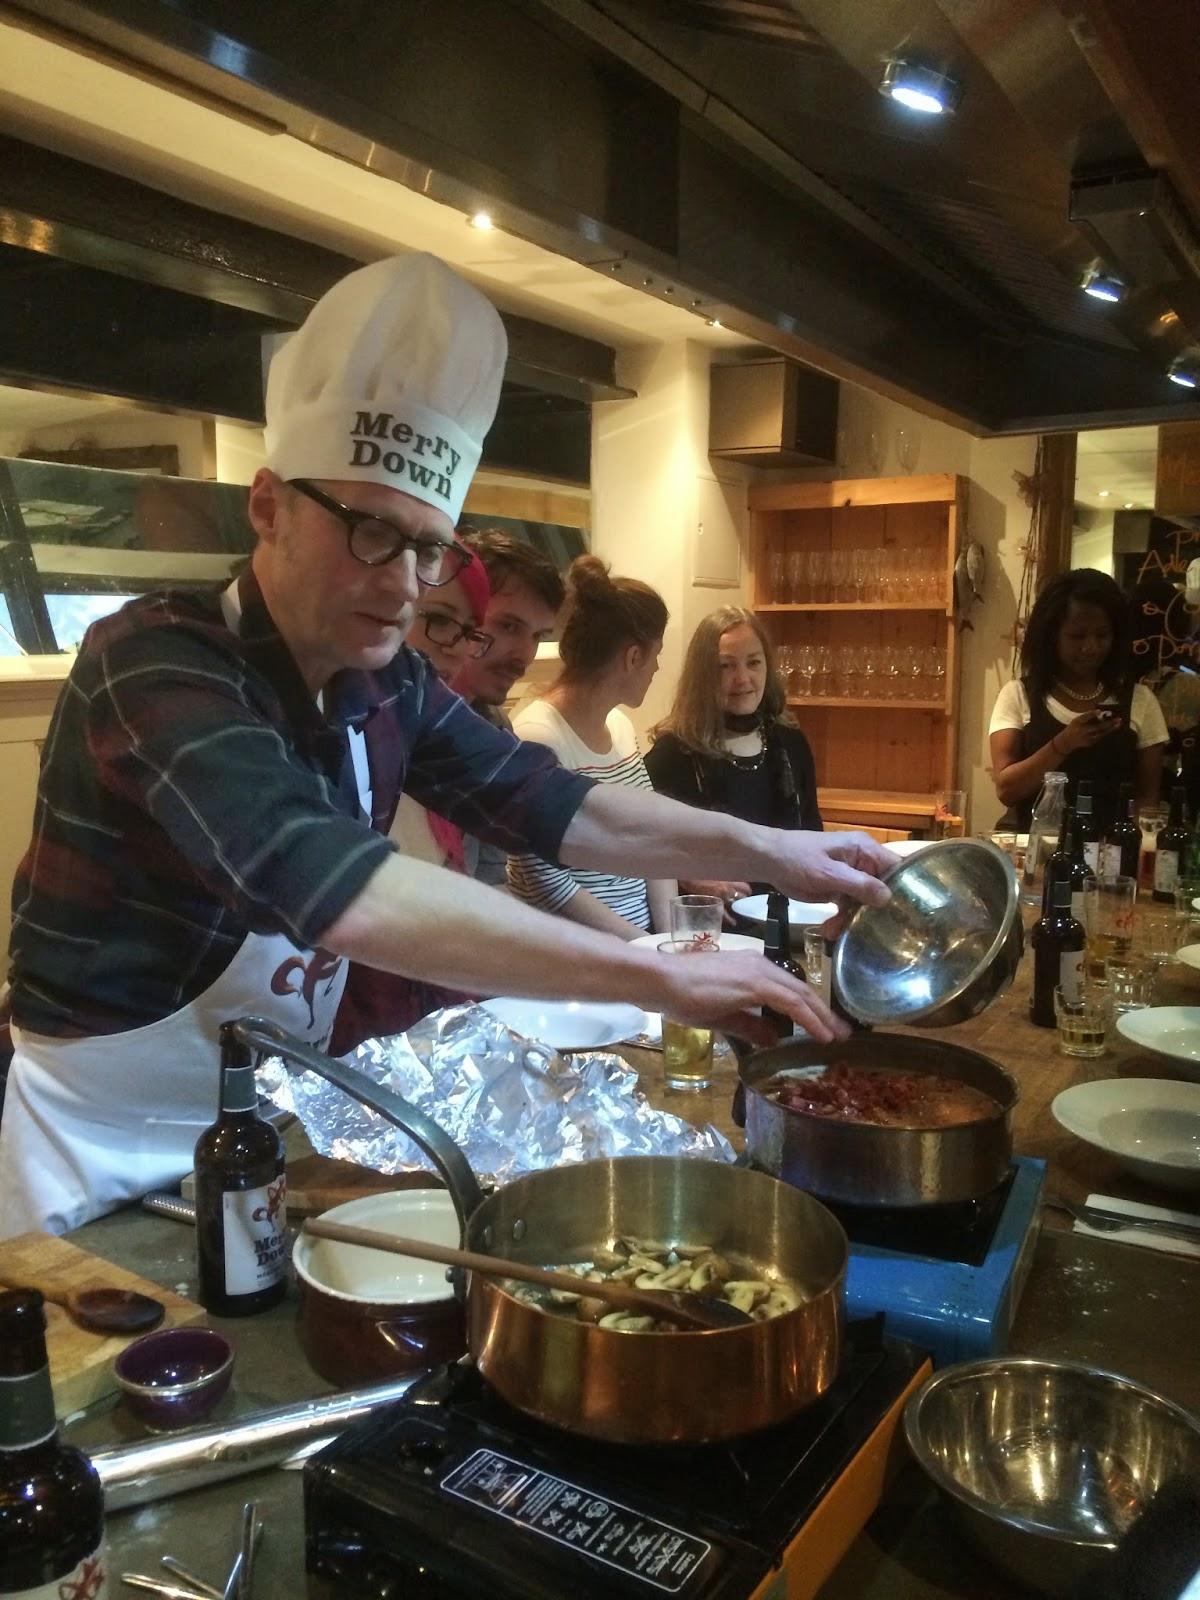 Ade Edmondson cooking at Food at 52 copyright madmumof7.com